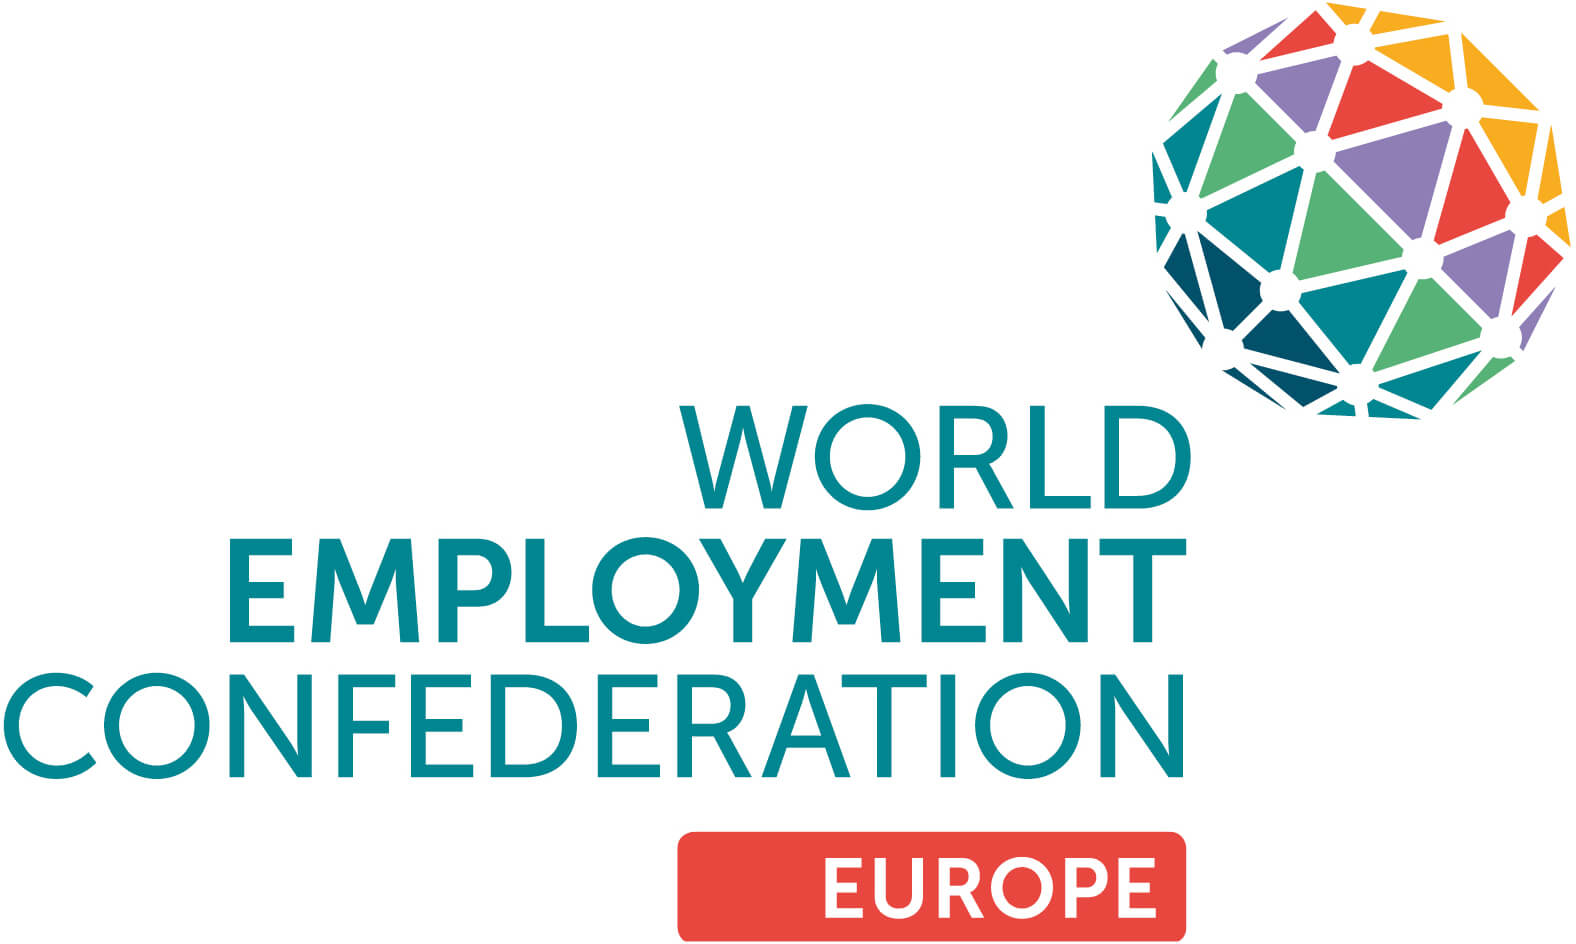 World Employment Confederation-Europe